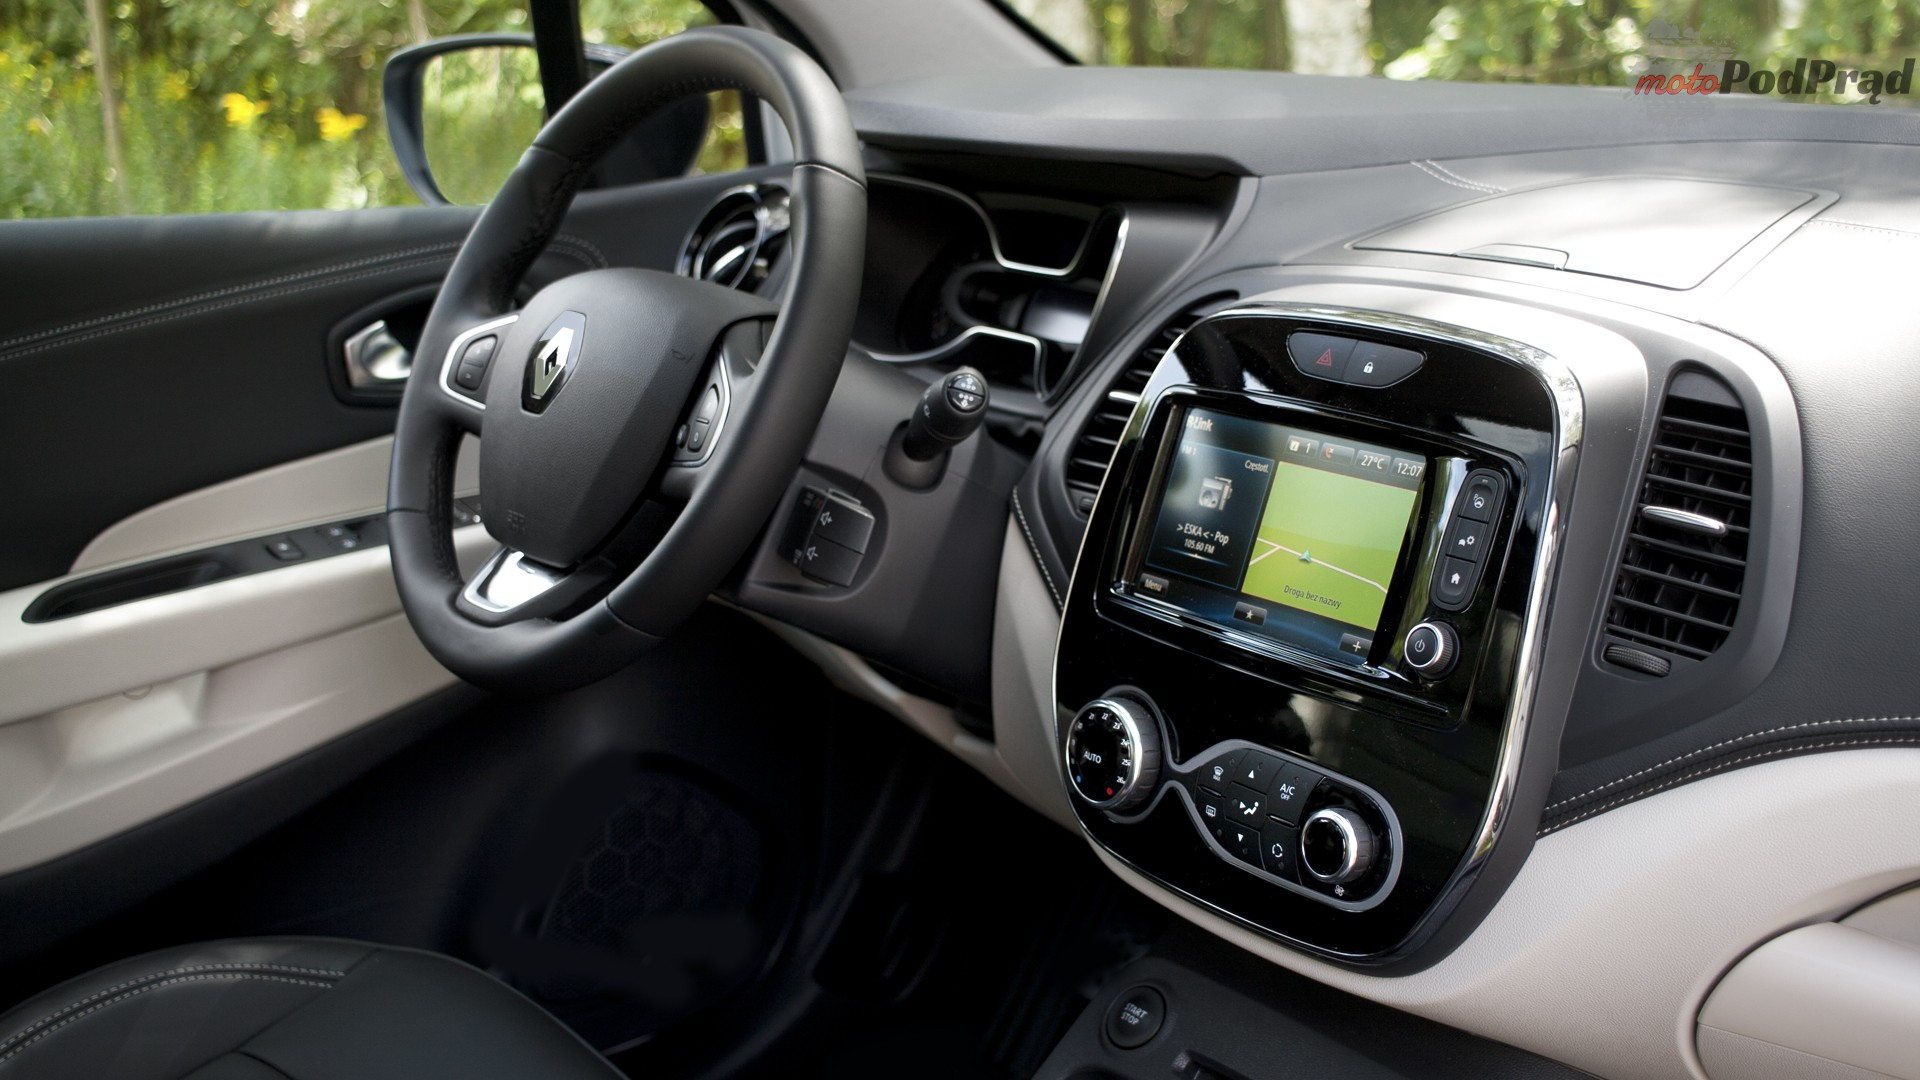 4 1 Test: Renault Captur Initiale Paris 1.2 Tce   diament w koronie?